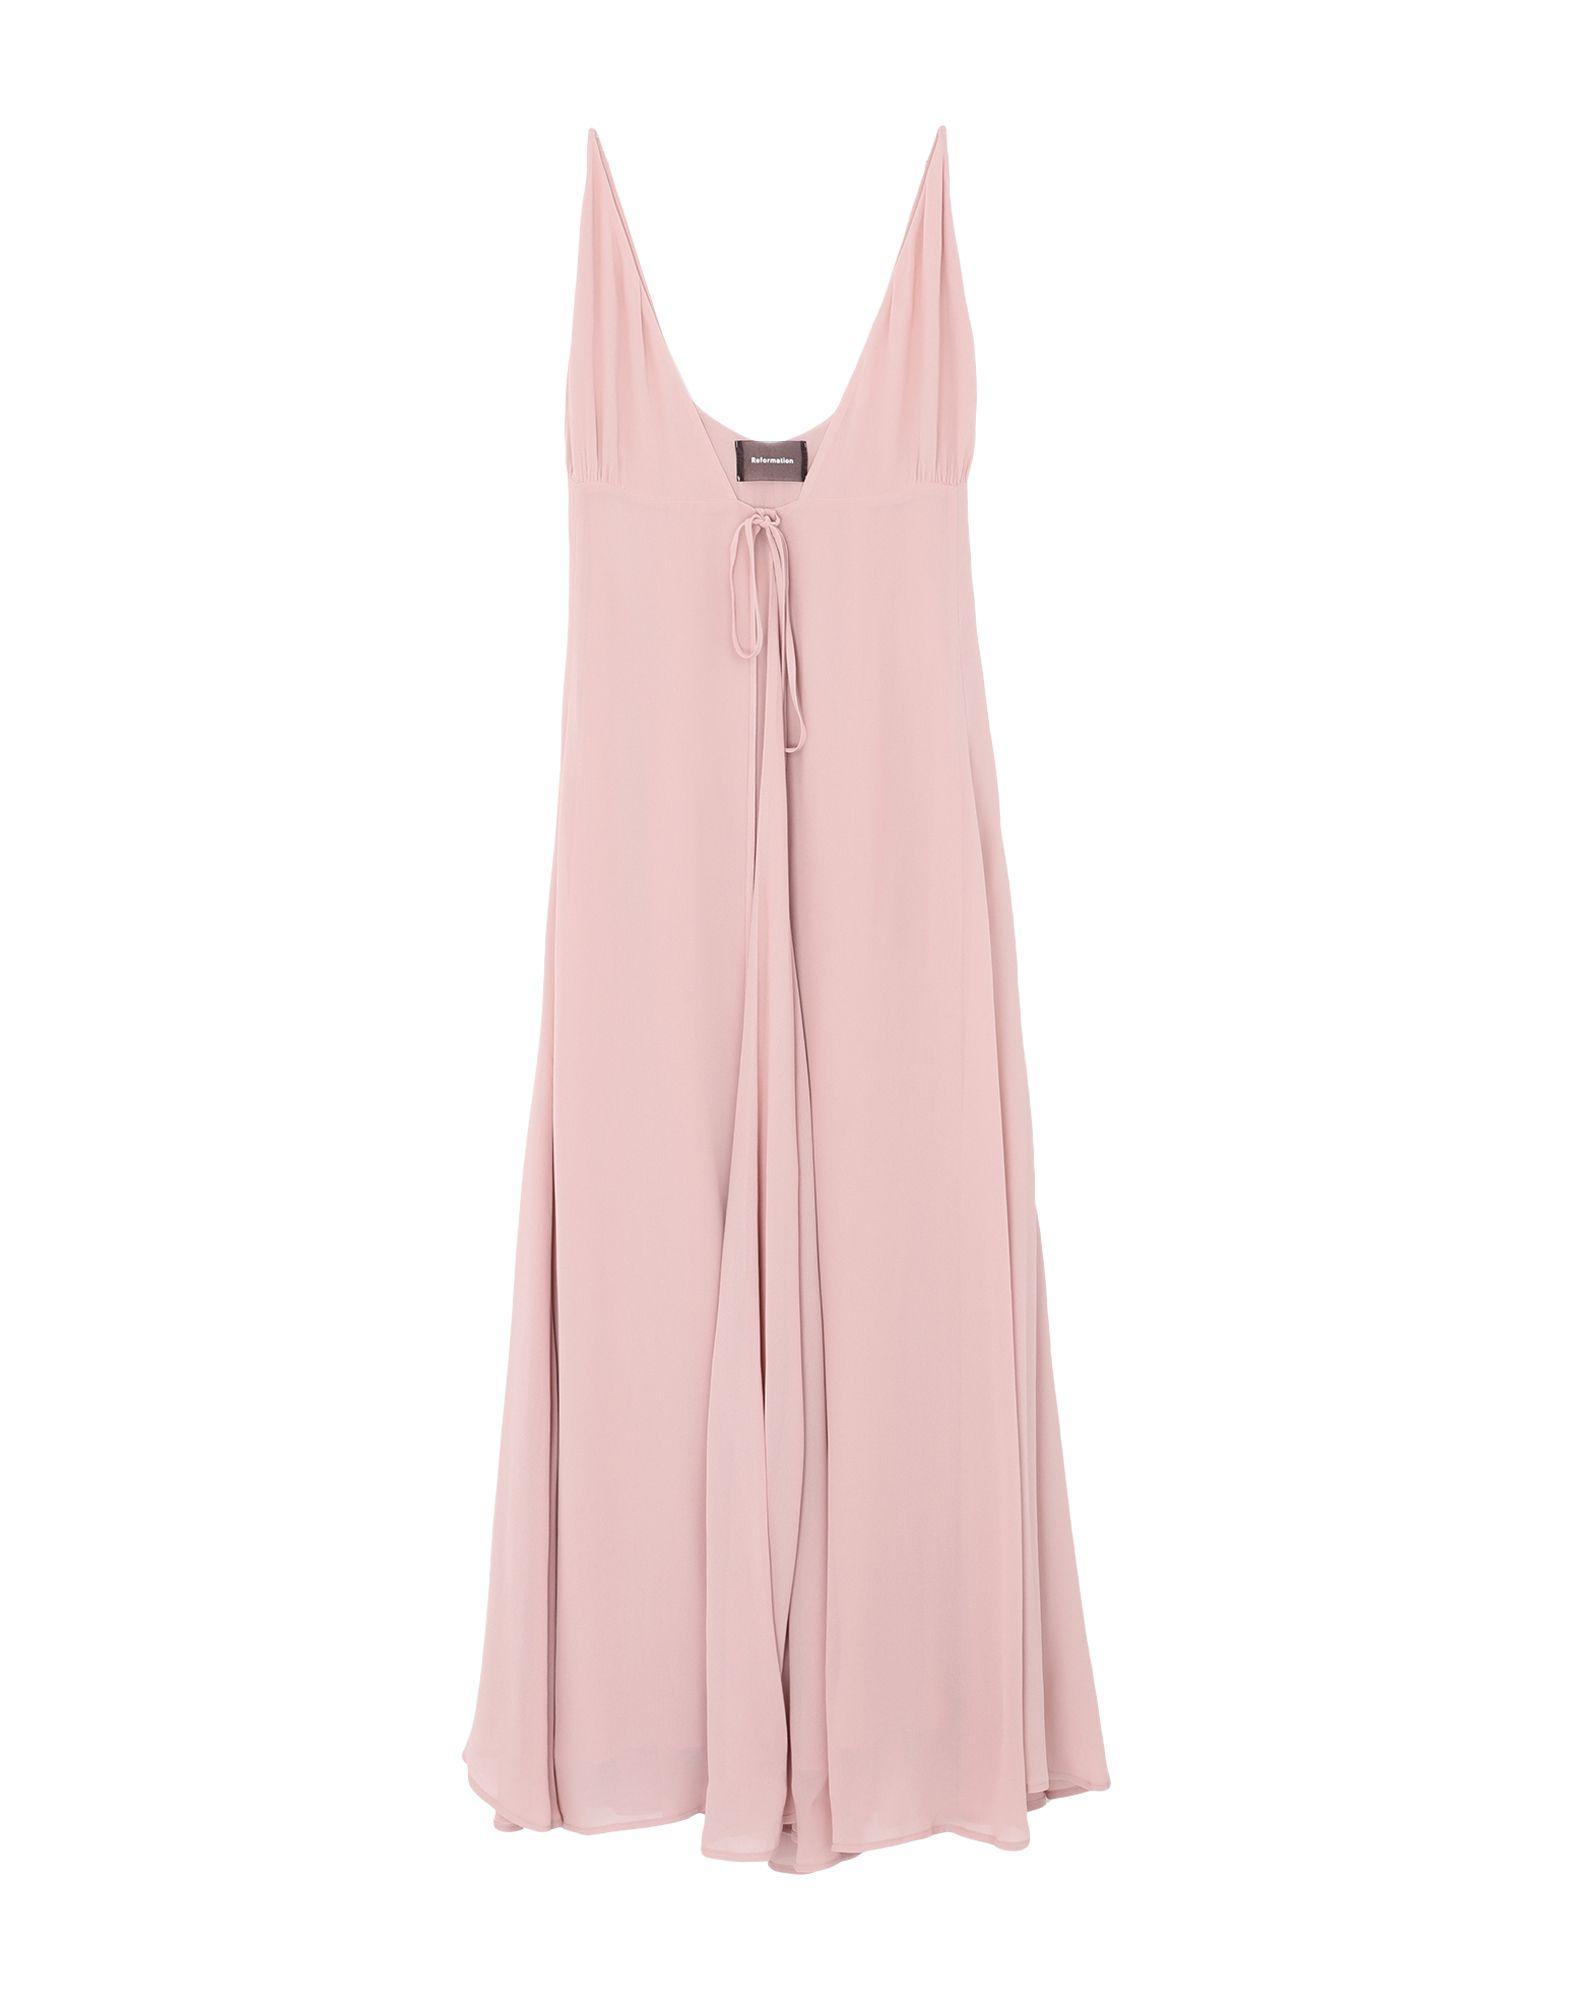 REFORMATION Long dresses. crepe, no appliqués, basic solid color, deep neckline, sleeveless, self-tie wrap closure, fully lined. 100% Viscose